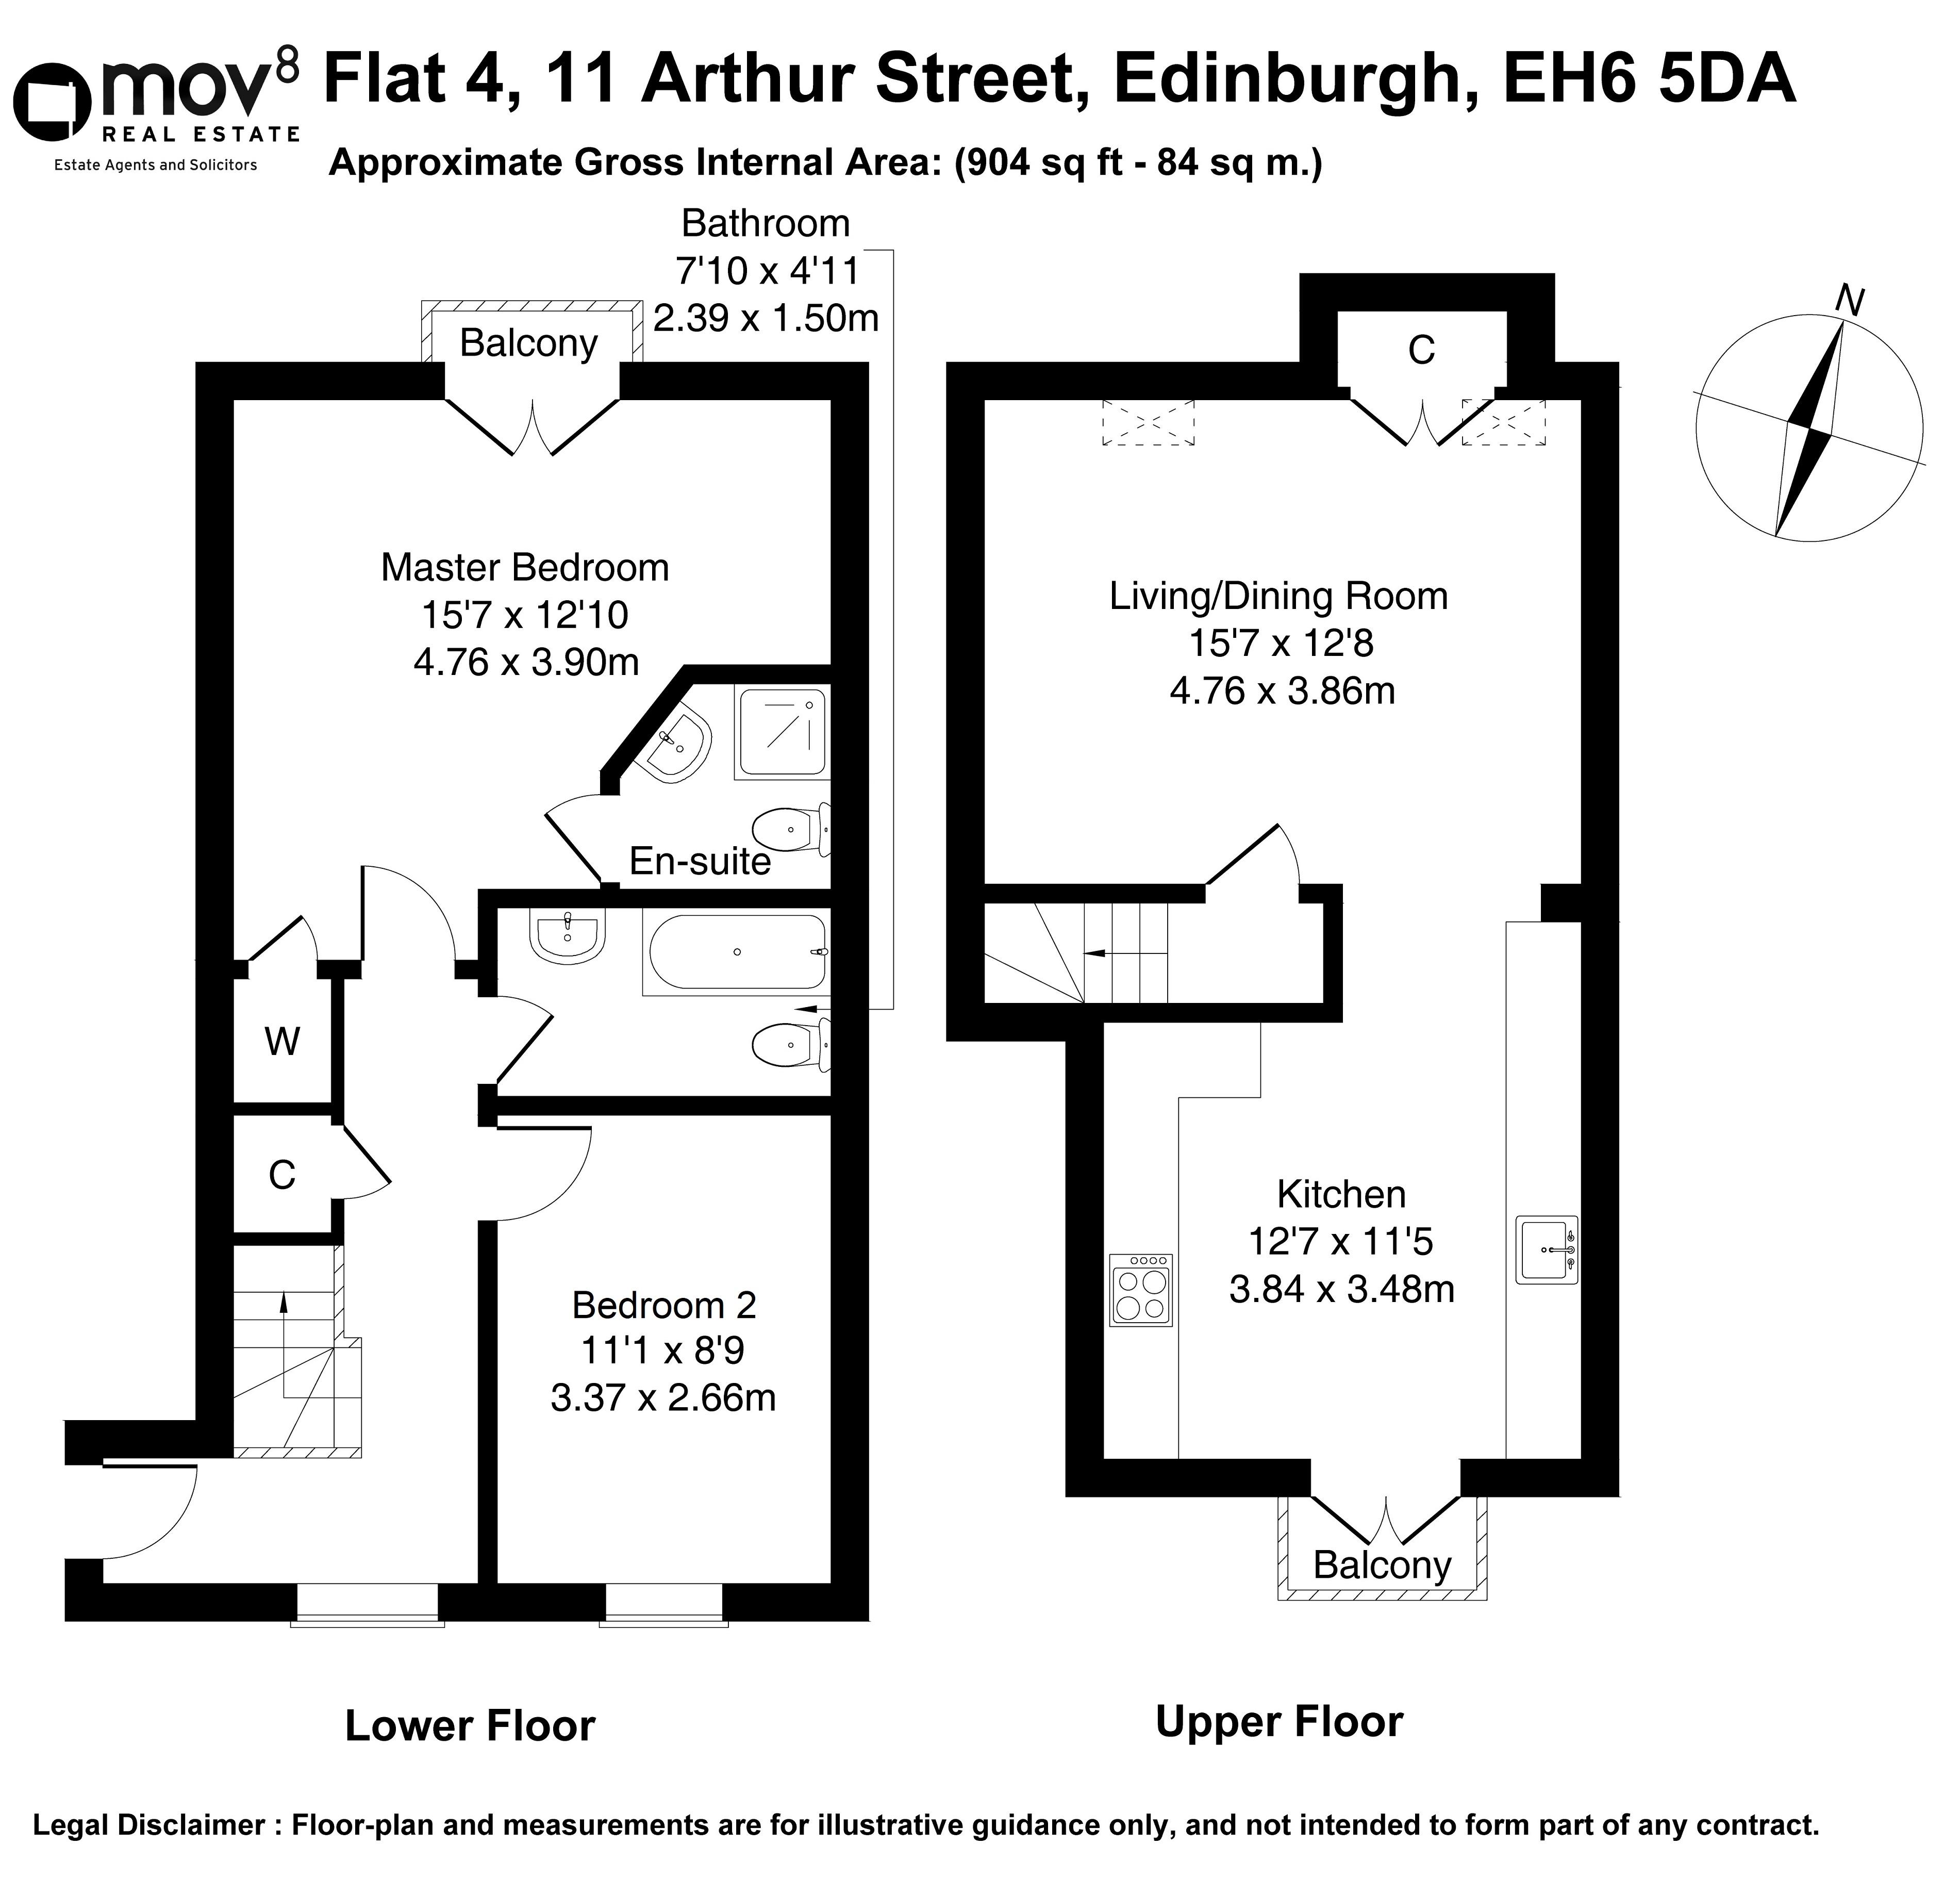 Floorplan 1 of Flat 4, 11 Arthur Street, Leith, Edinburgh, EH6 5DA